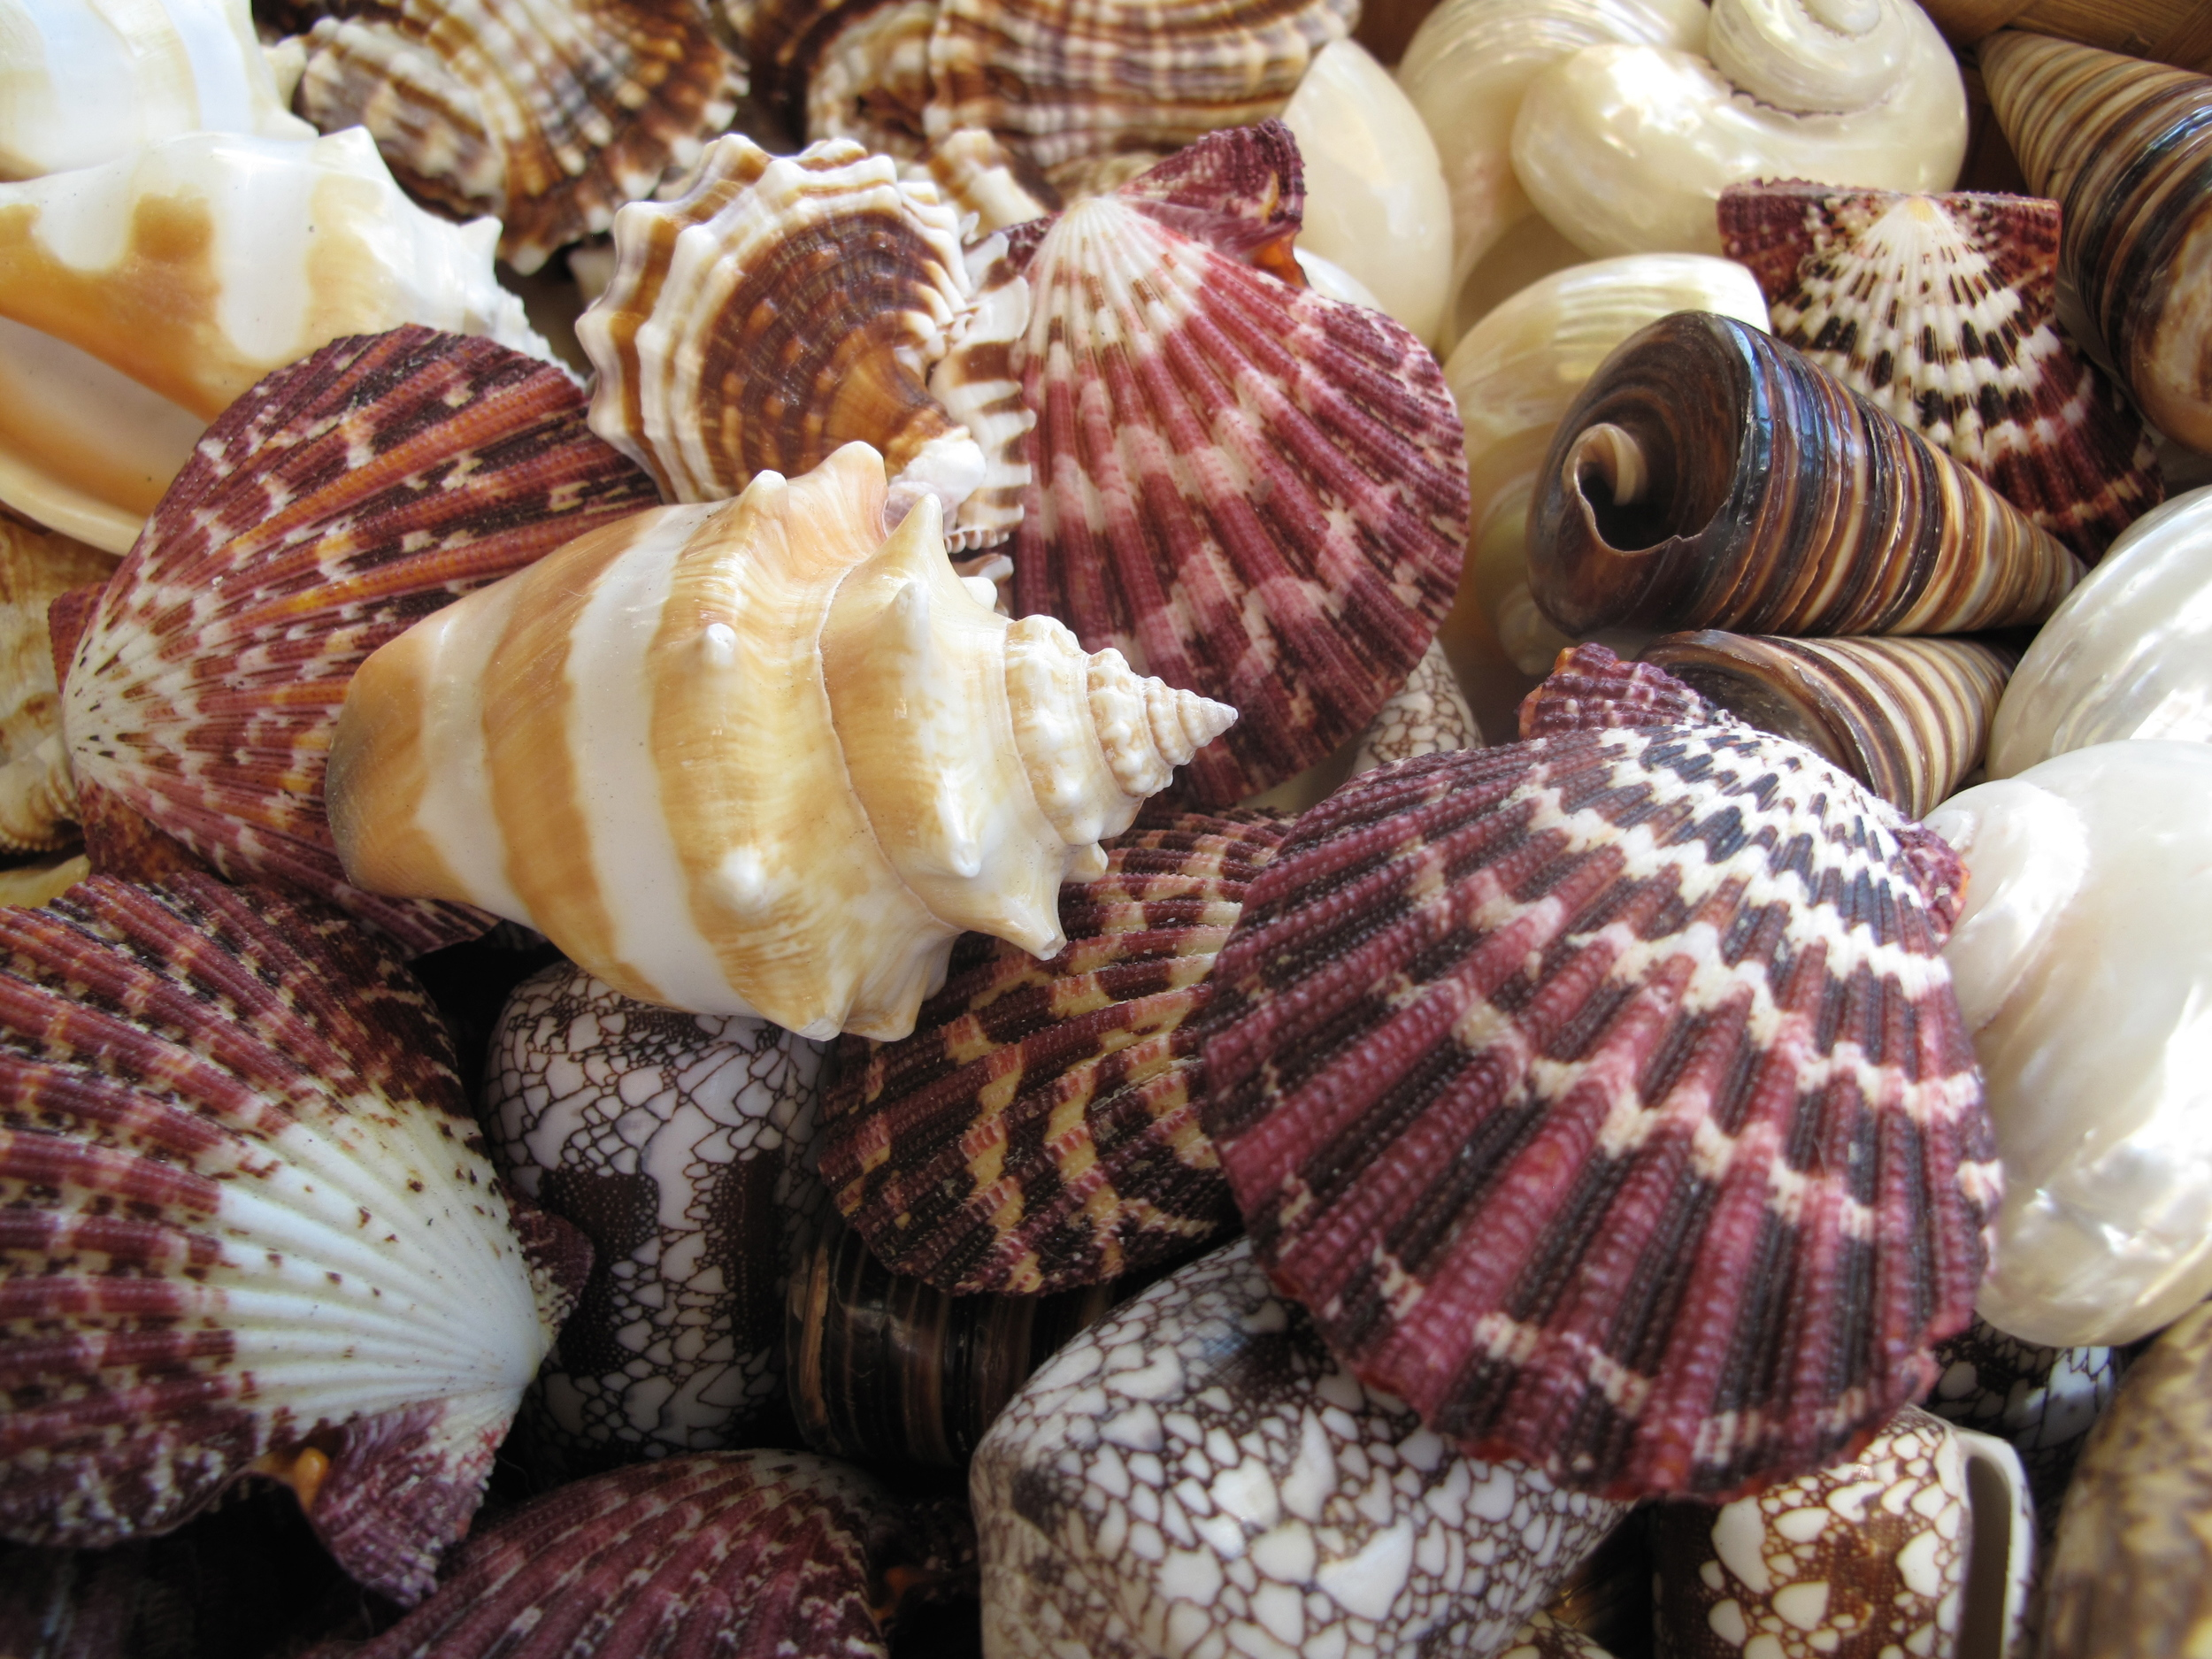 Seashells being sold on Capri island